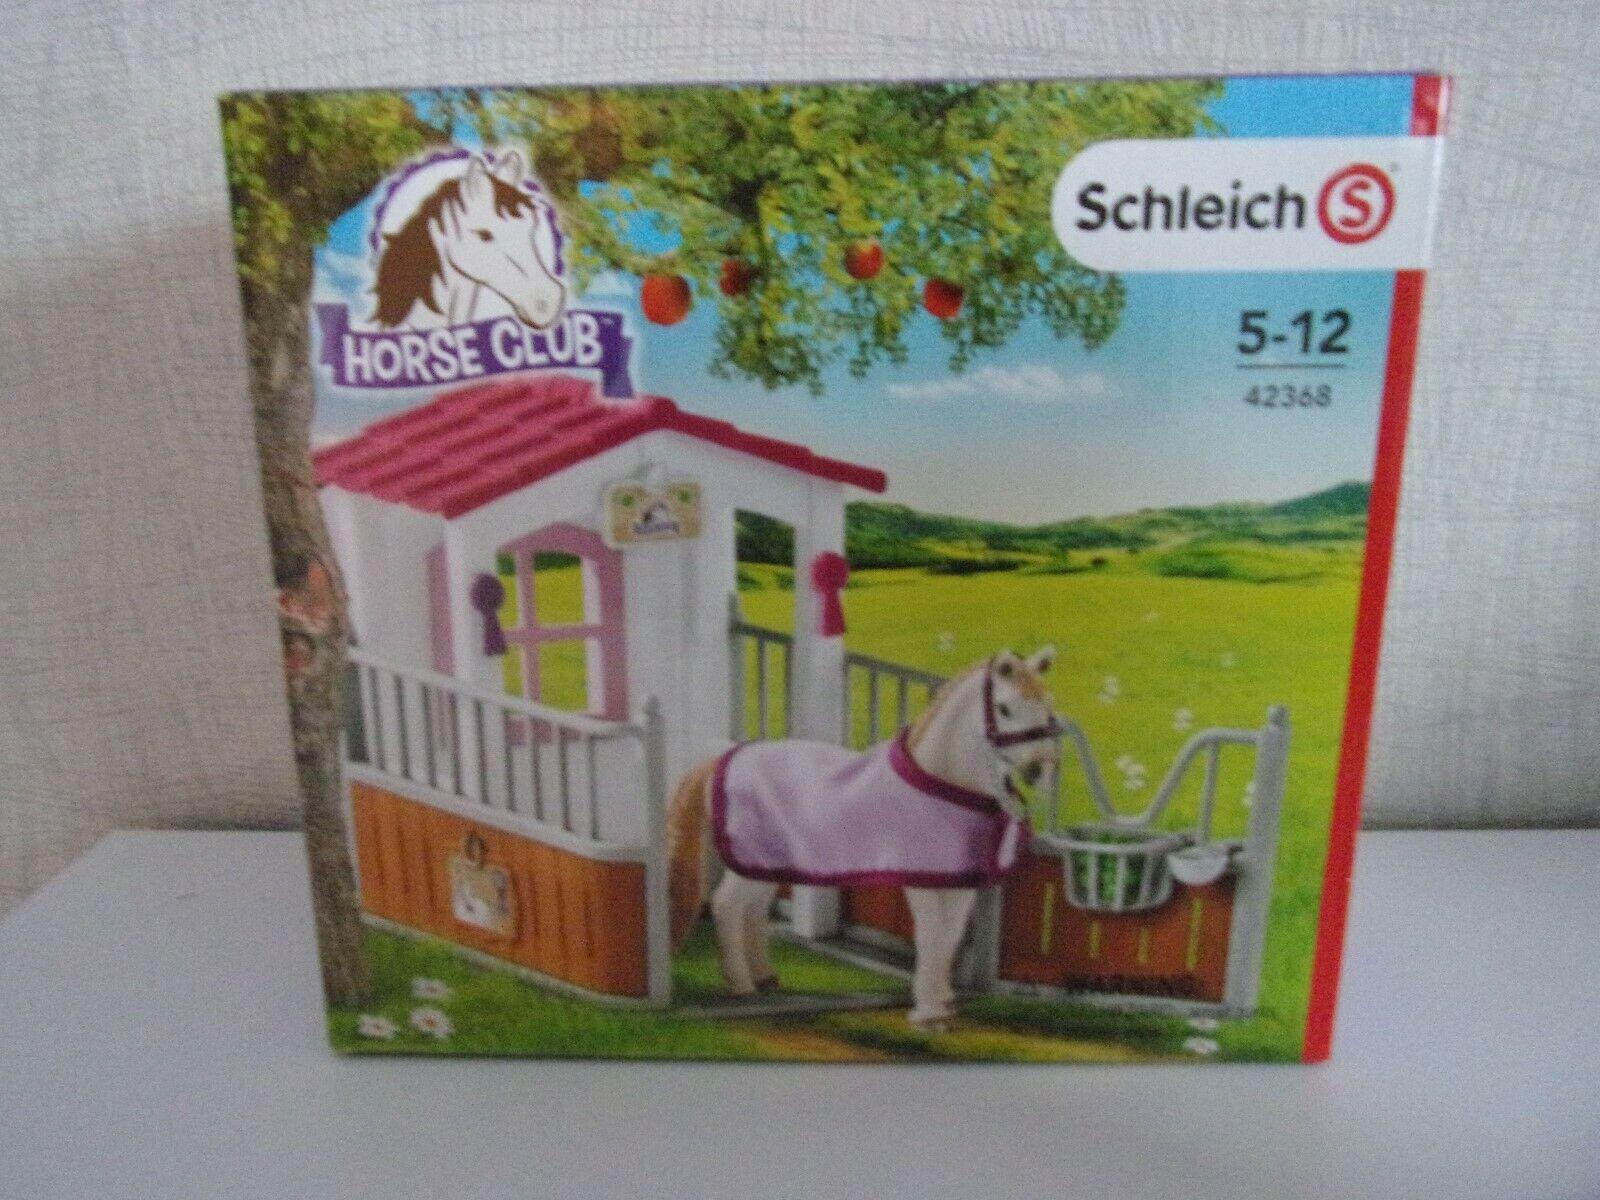 Schleich Horse Club 42368 Horse Box with Lusitano Mare - Nip